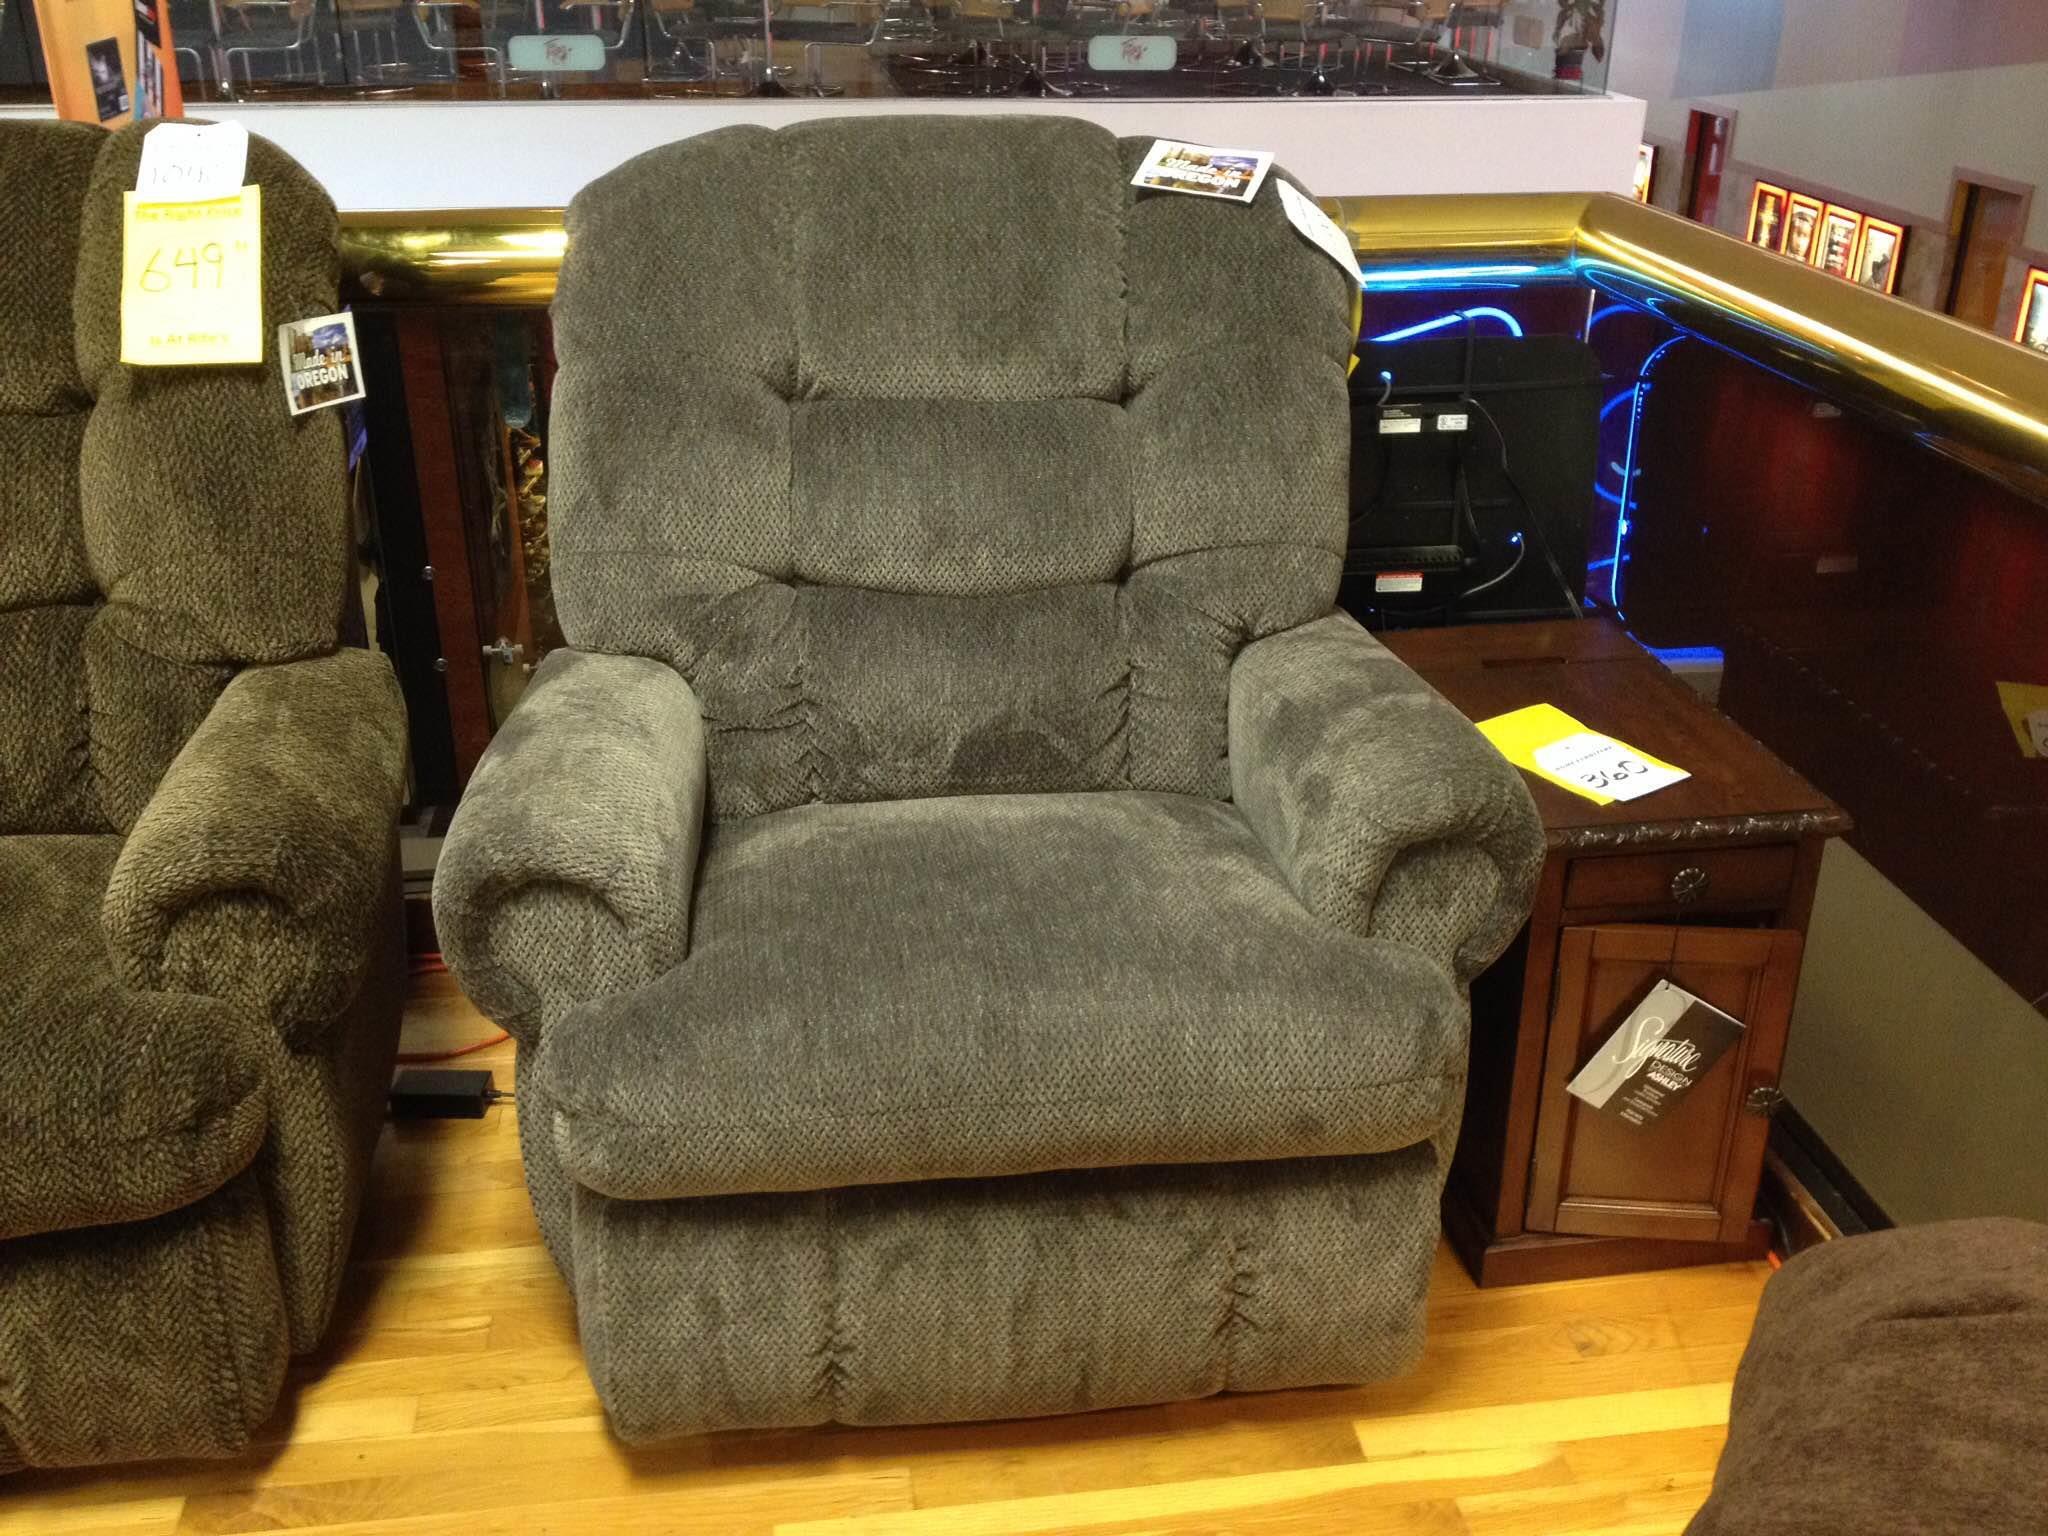 Stanton 834 Big Manu0027s Power Recliner  sc 1 st  Rifeu0027s Home Furniture & Stanton 834 Big Manu0027s Power Recliner - Rifeu0027s Home Furniture ... islam-shia.org